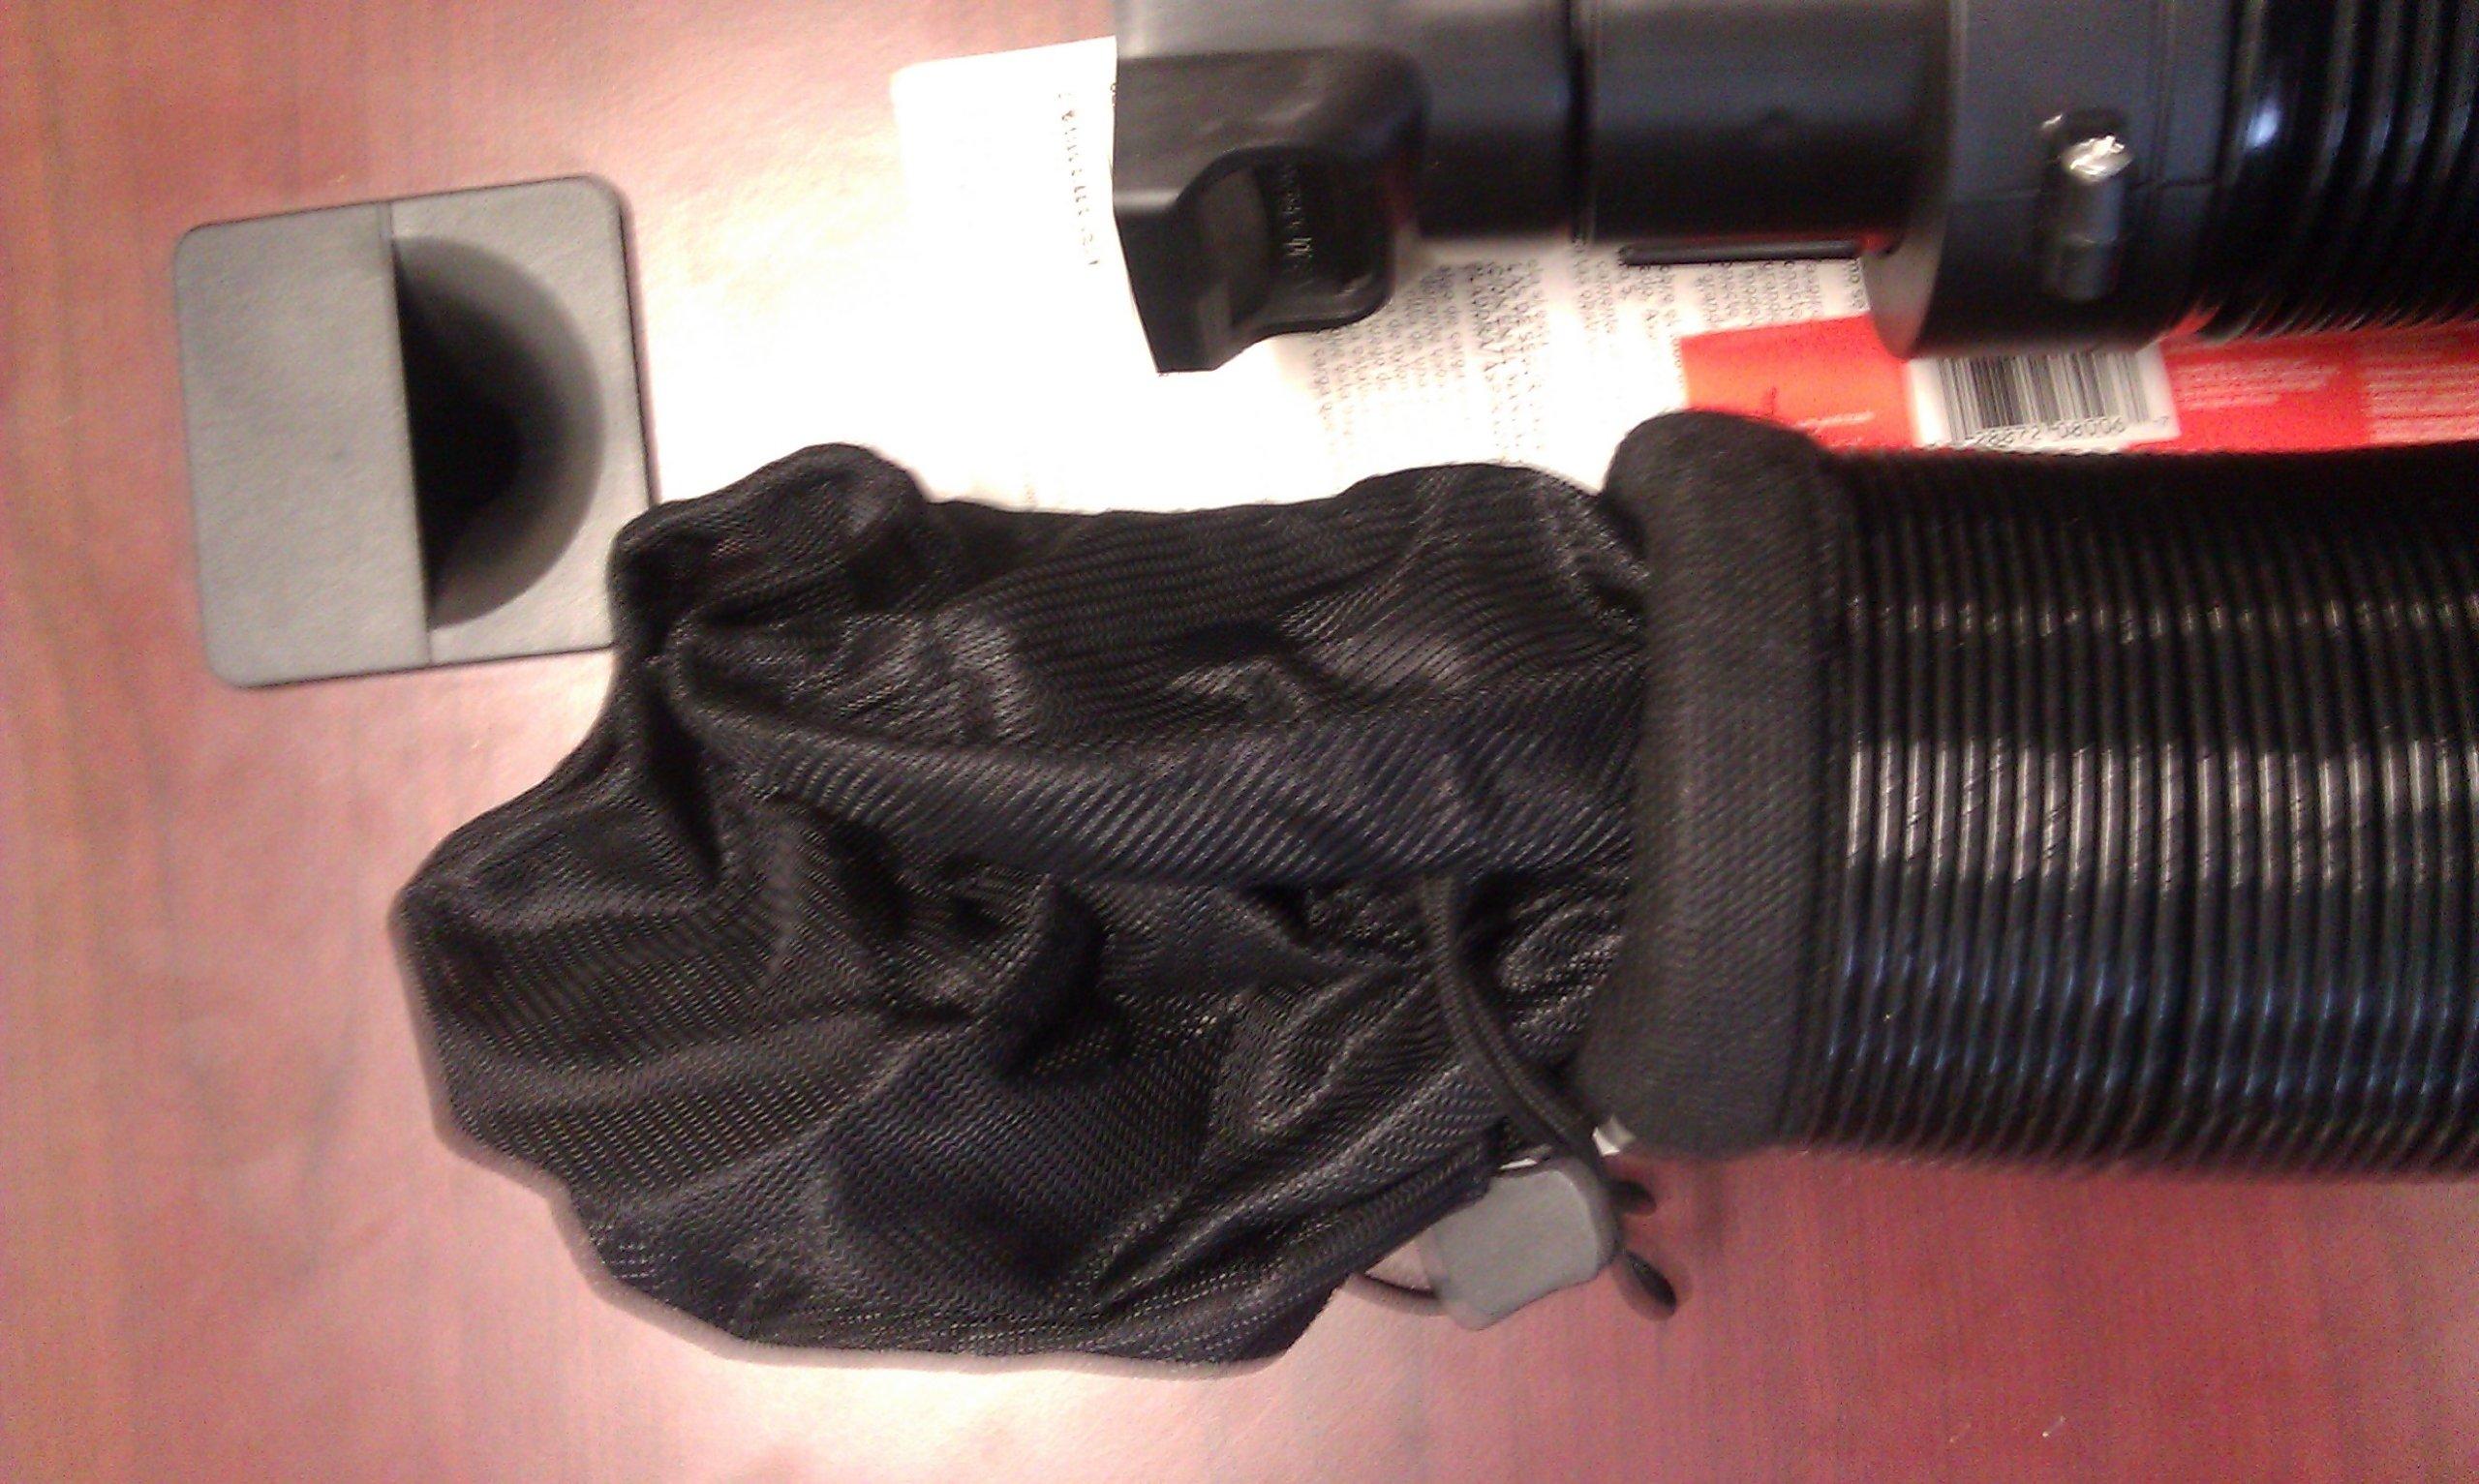 BLACK+DECKER BV-006 Blower/Vacuum Leaf Collection System